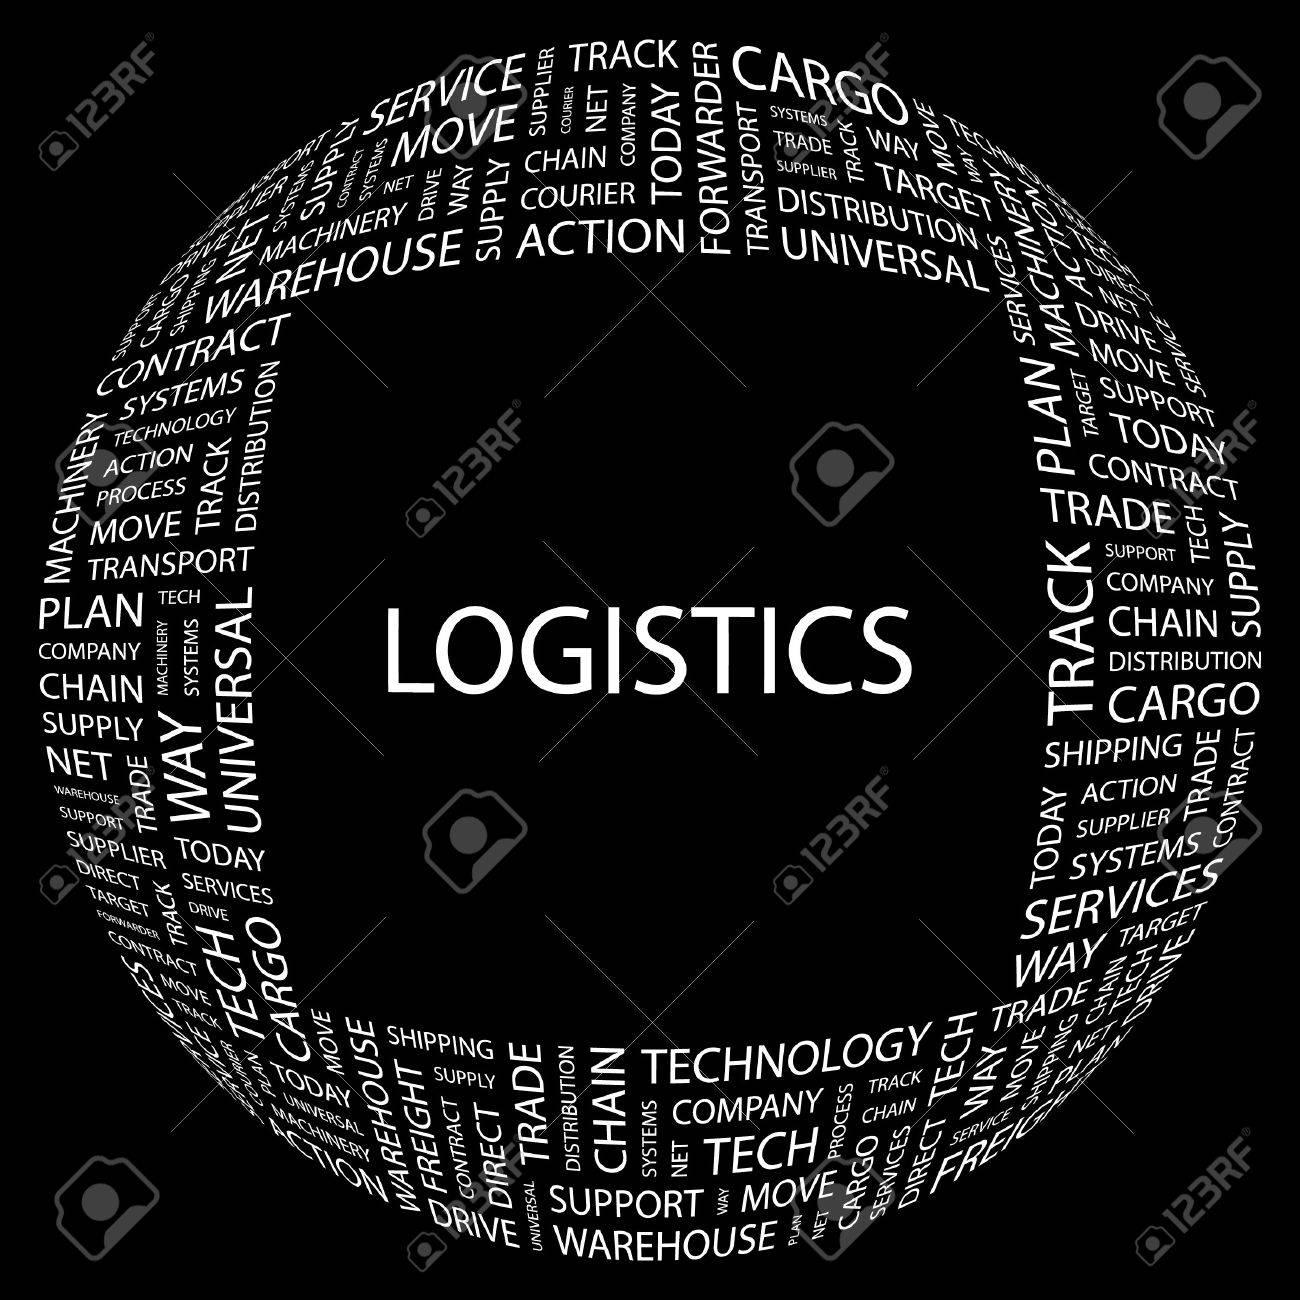 LOGISTICS. Word collage on black background.  illustration. Stock Vector - 7339932